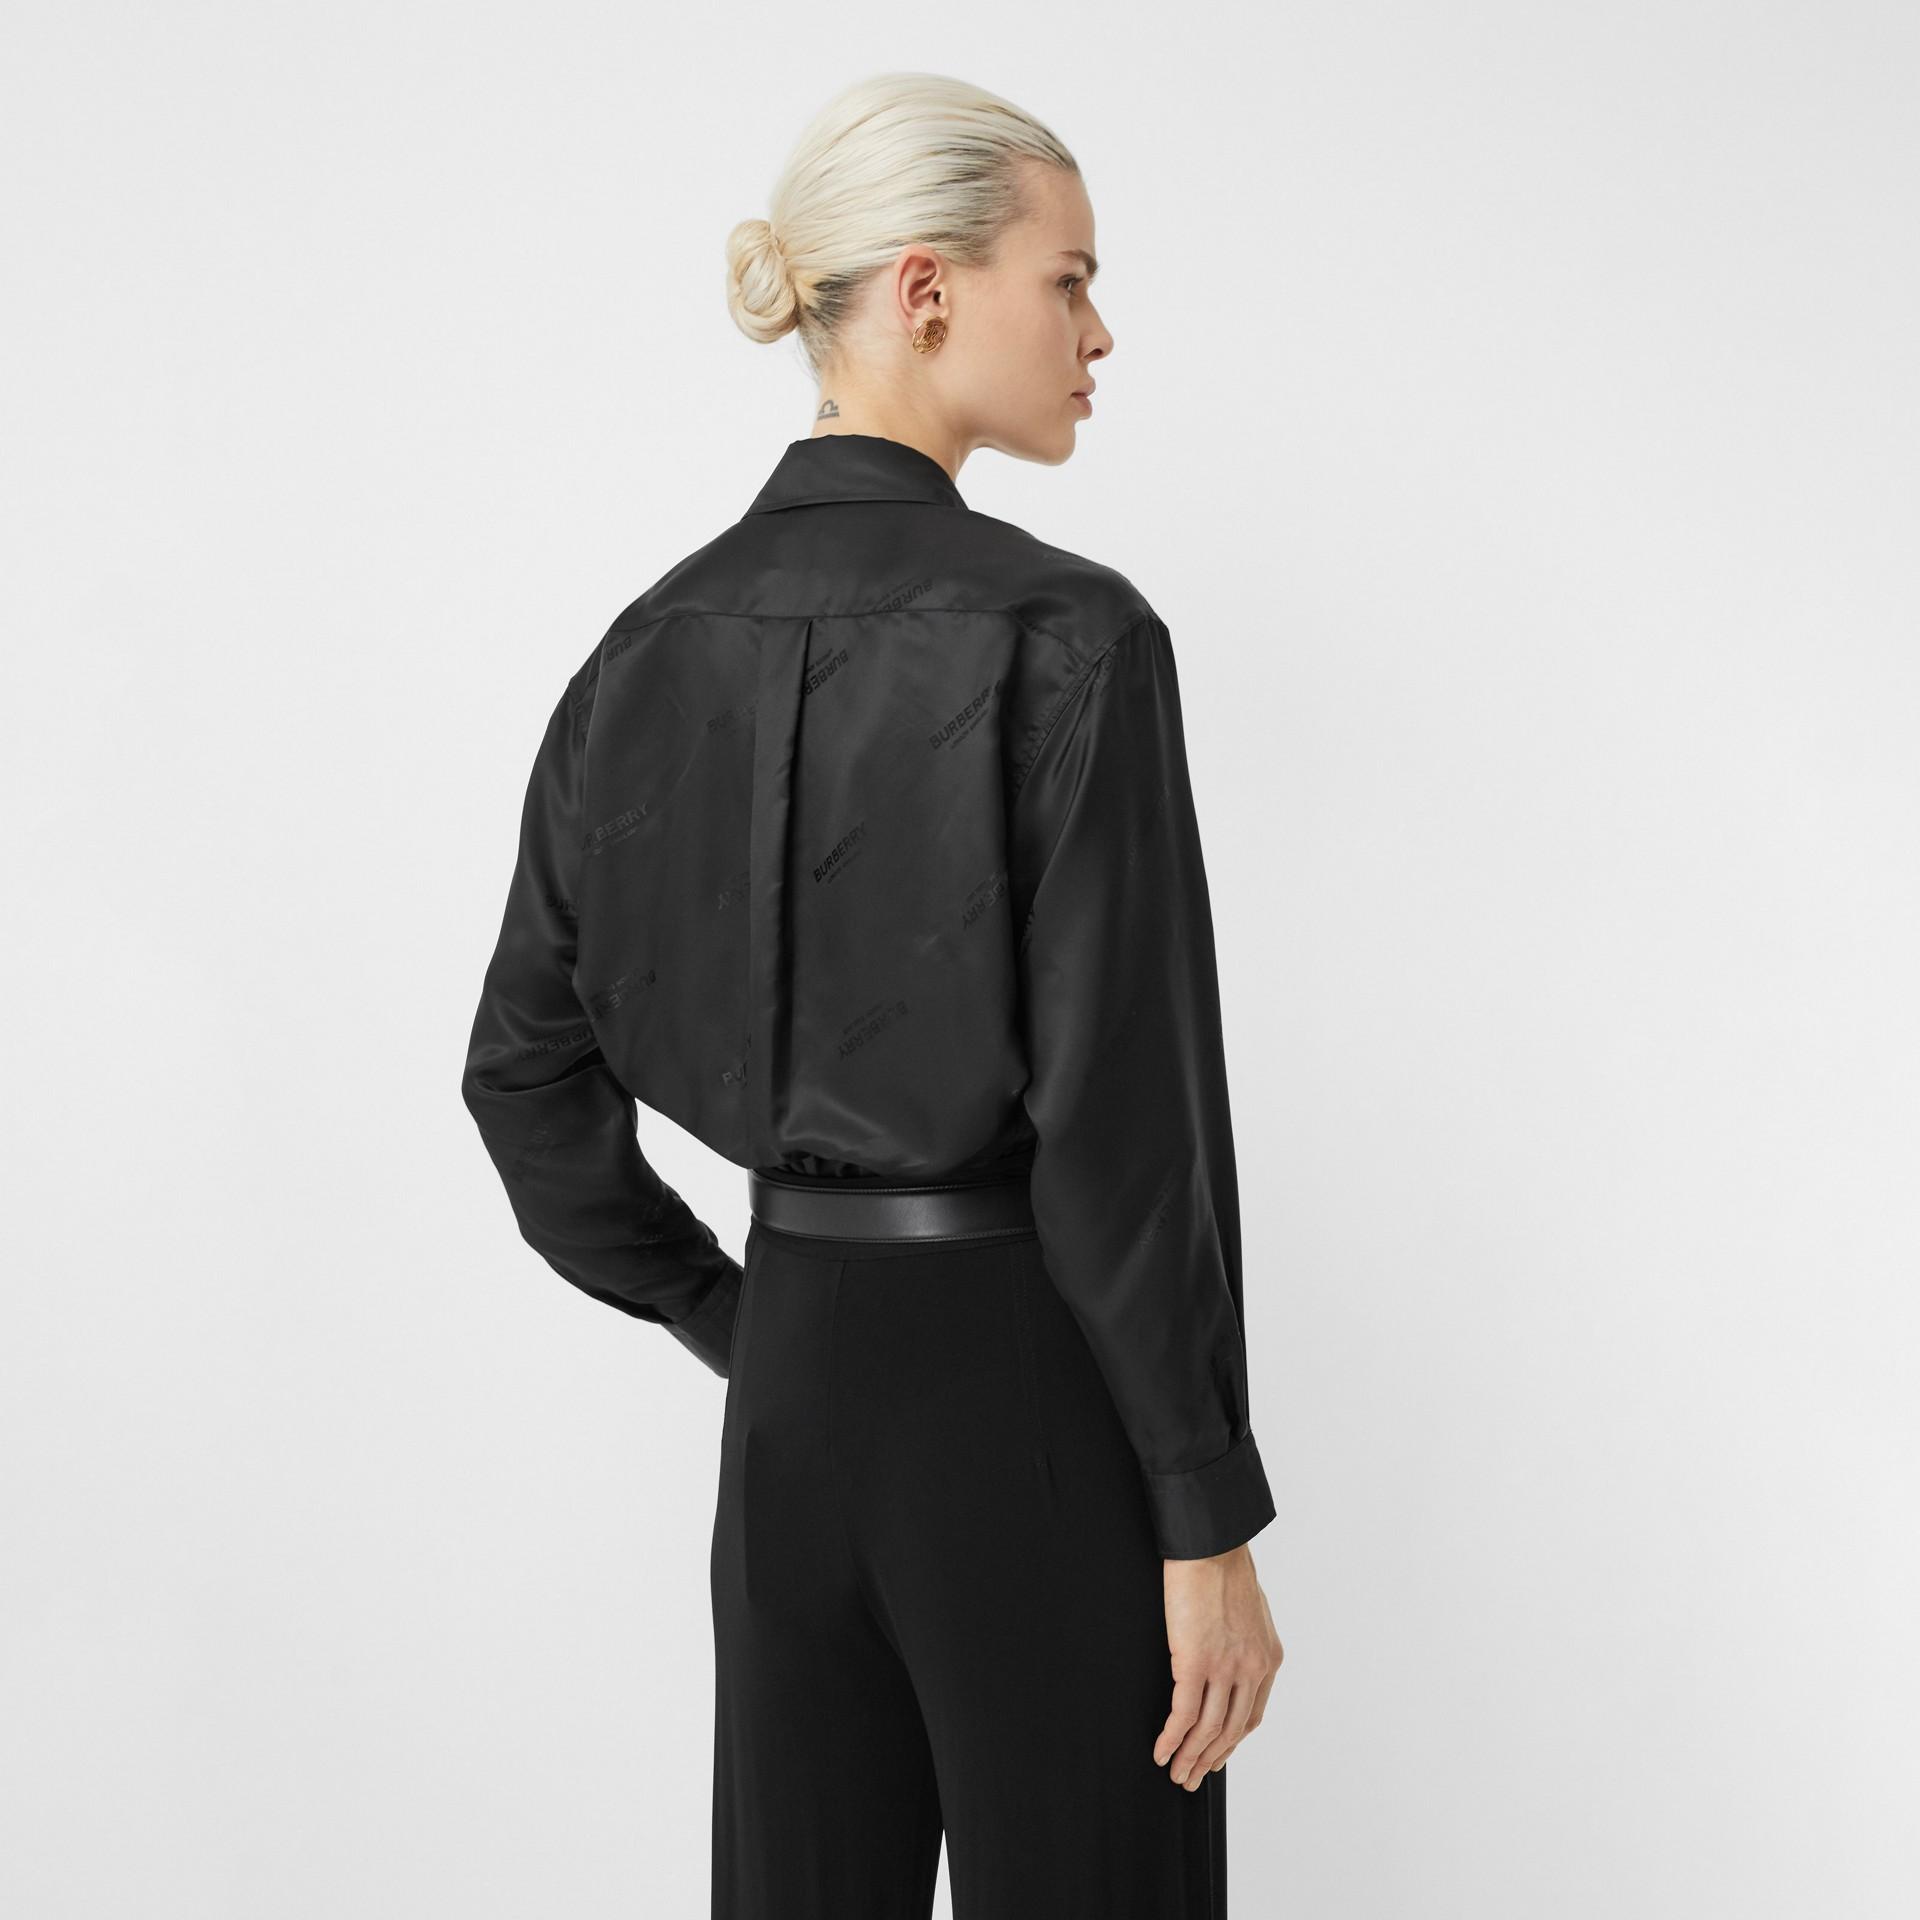 Logo Jacquard Shirt in Black - Women | Burberry Hong Kong S.A.R - gallery image 2